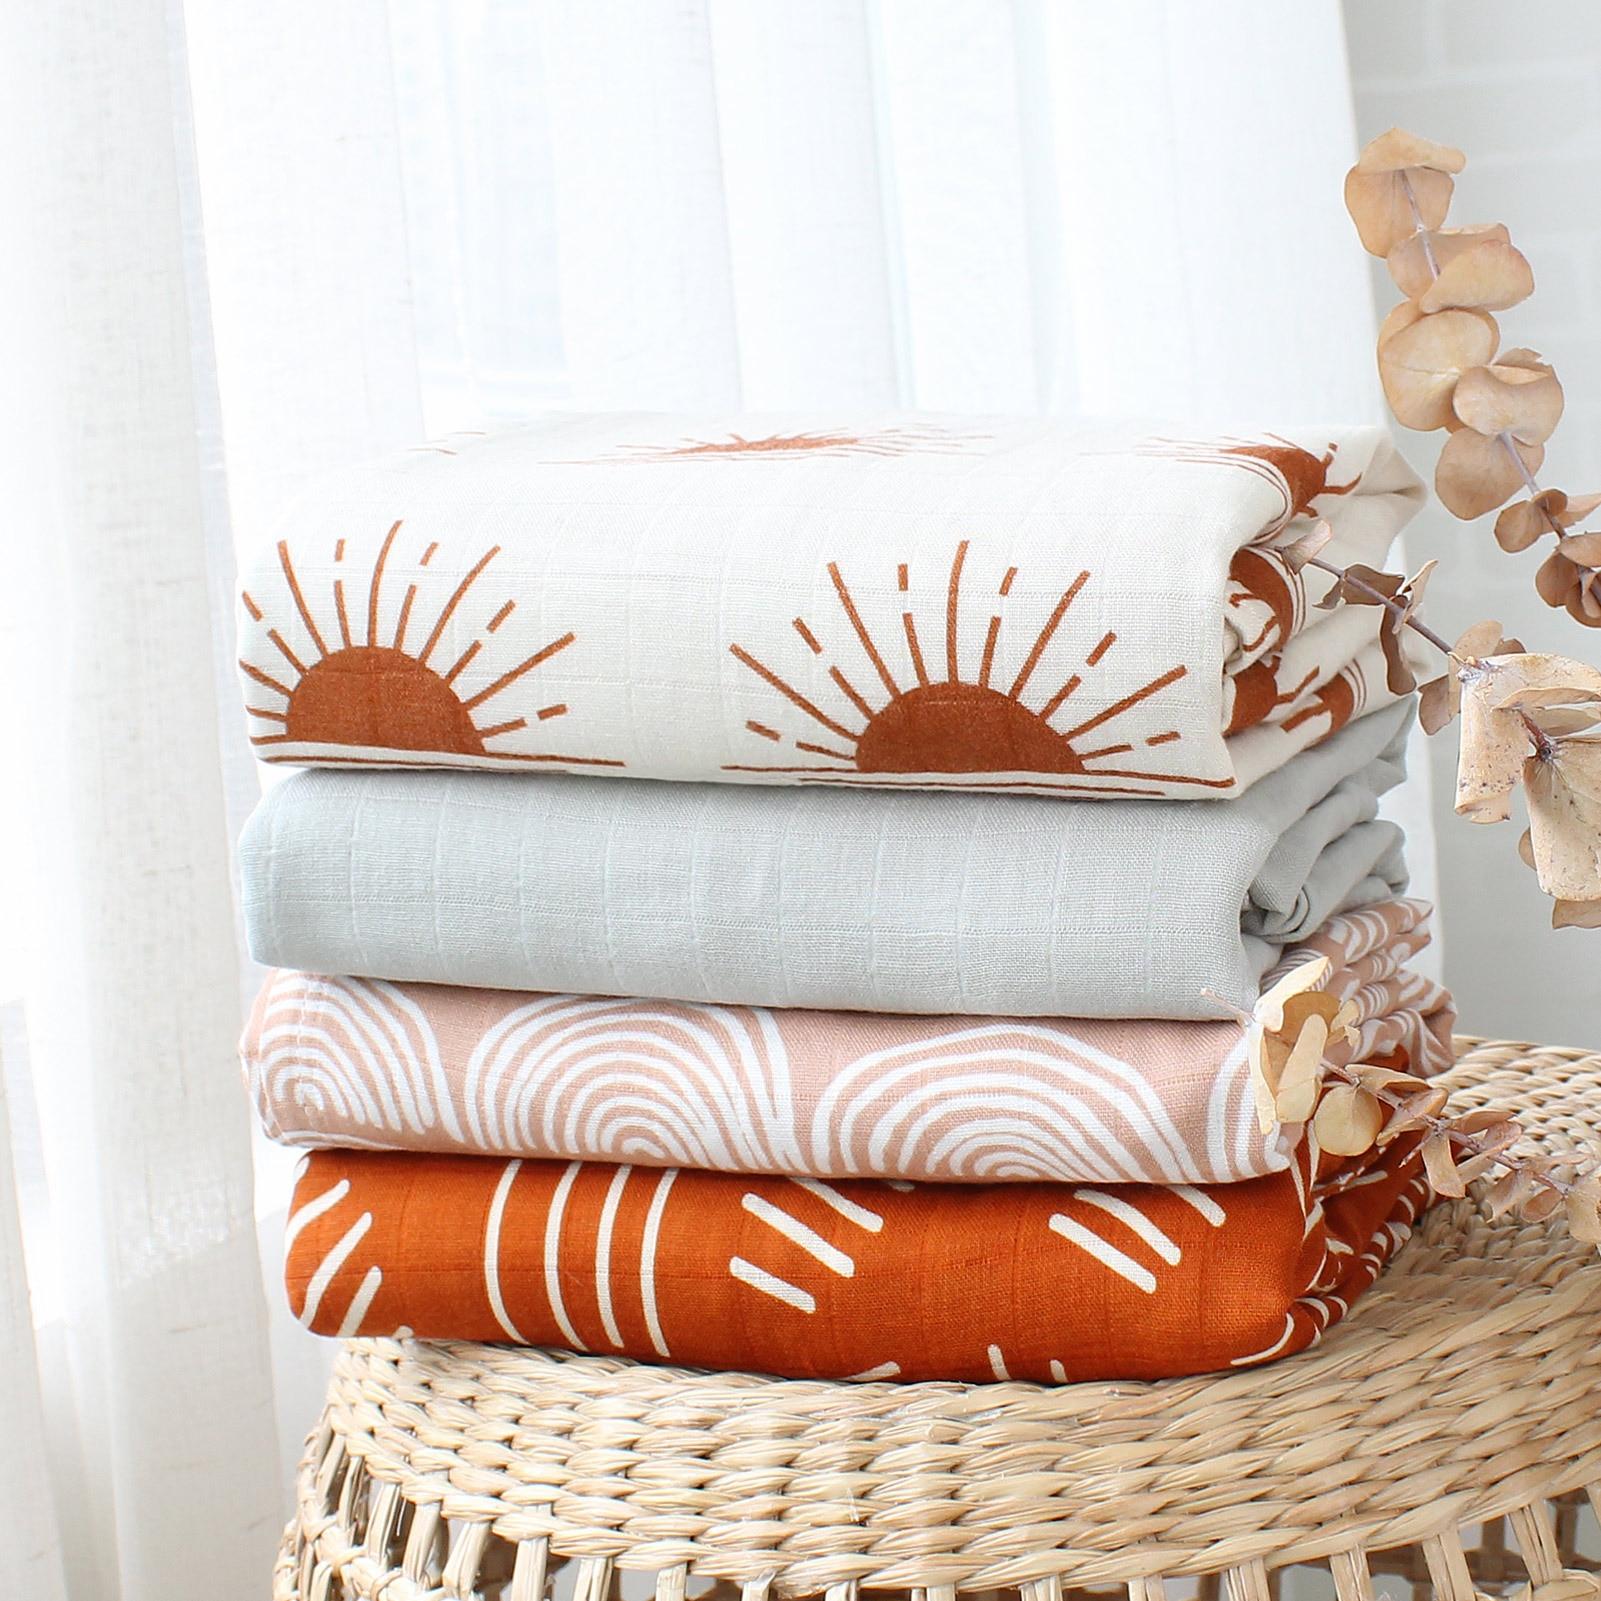 120x120cm Muslin Blanket Cotton Baby Swaddle Bamboo Soft Newborn Blanket Bath Towel Gauze Infant Wrap Sleepsack Stroller Cover